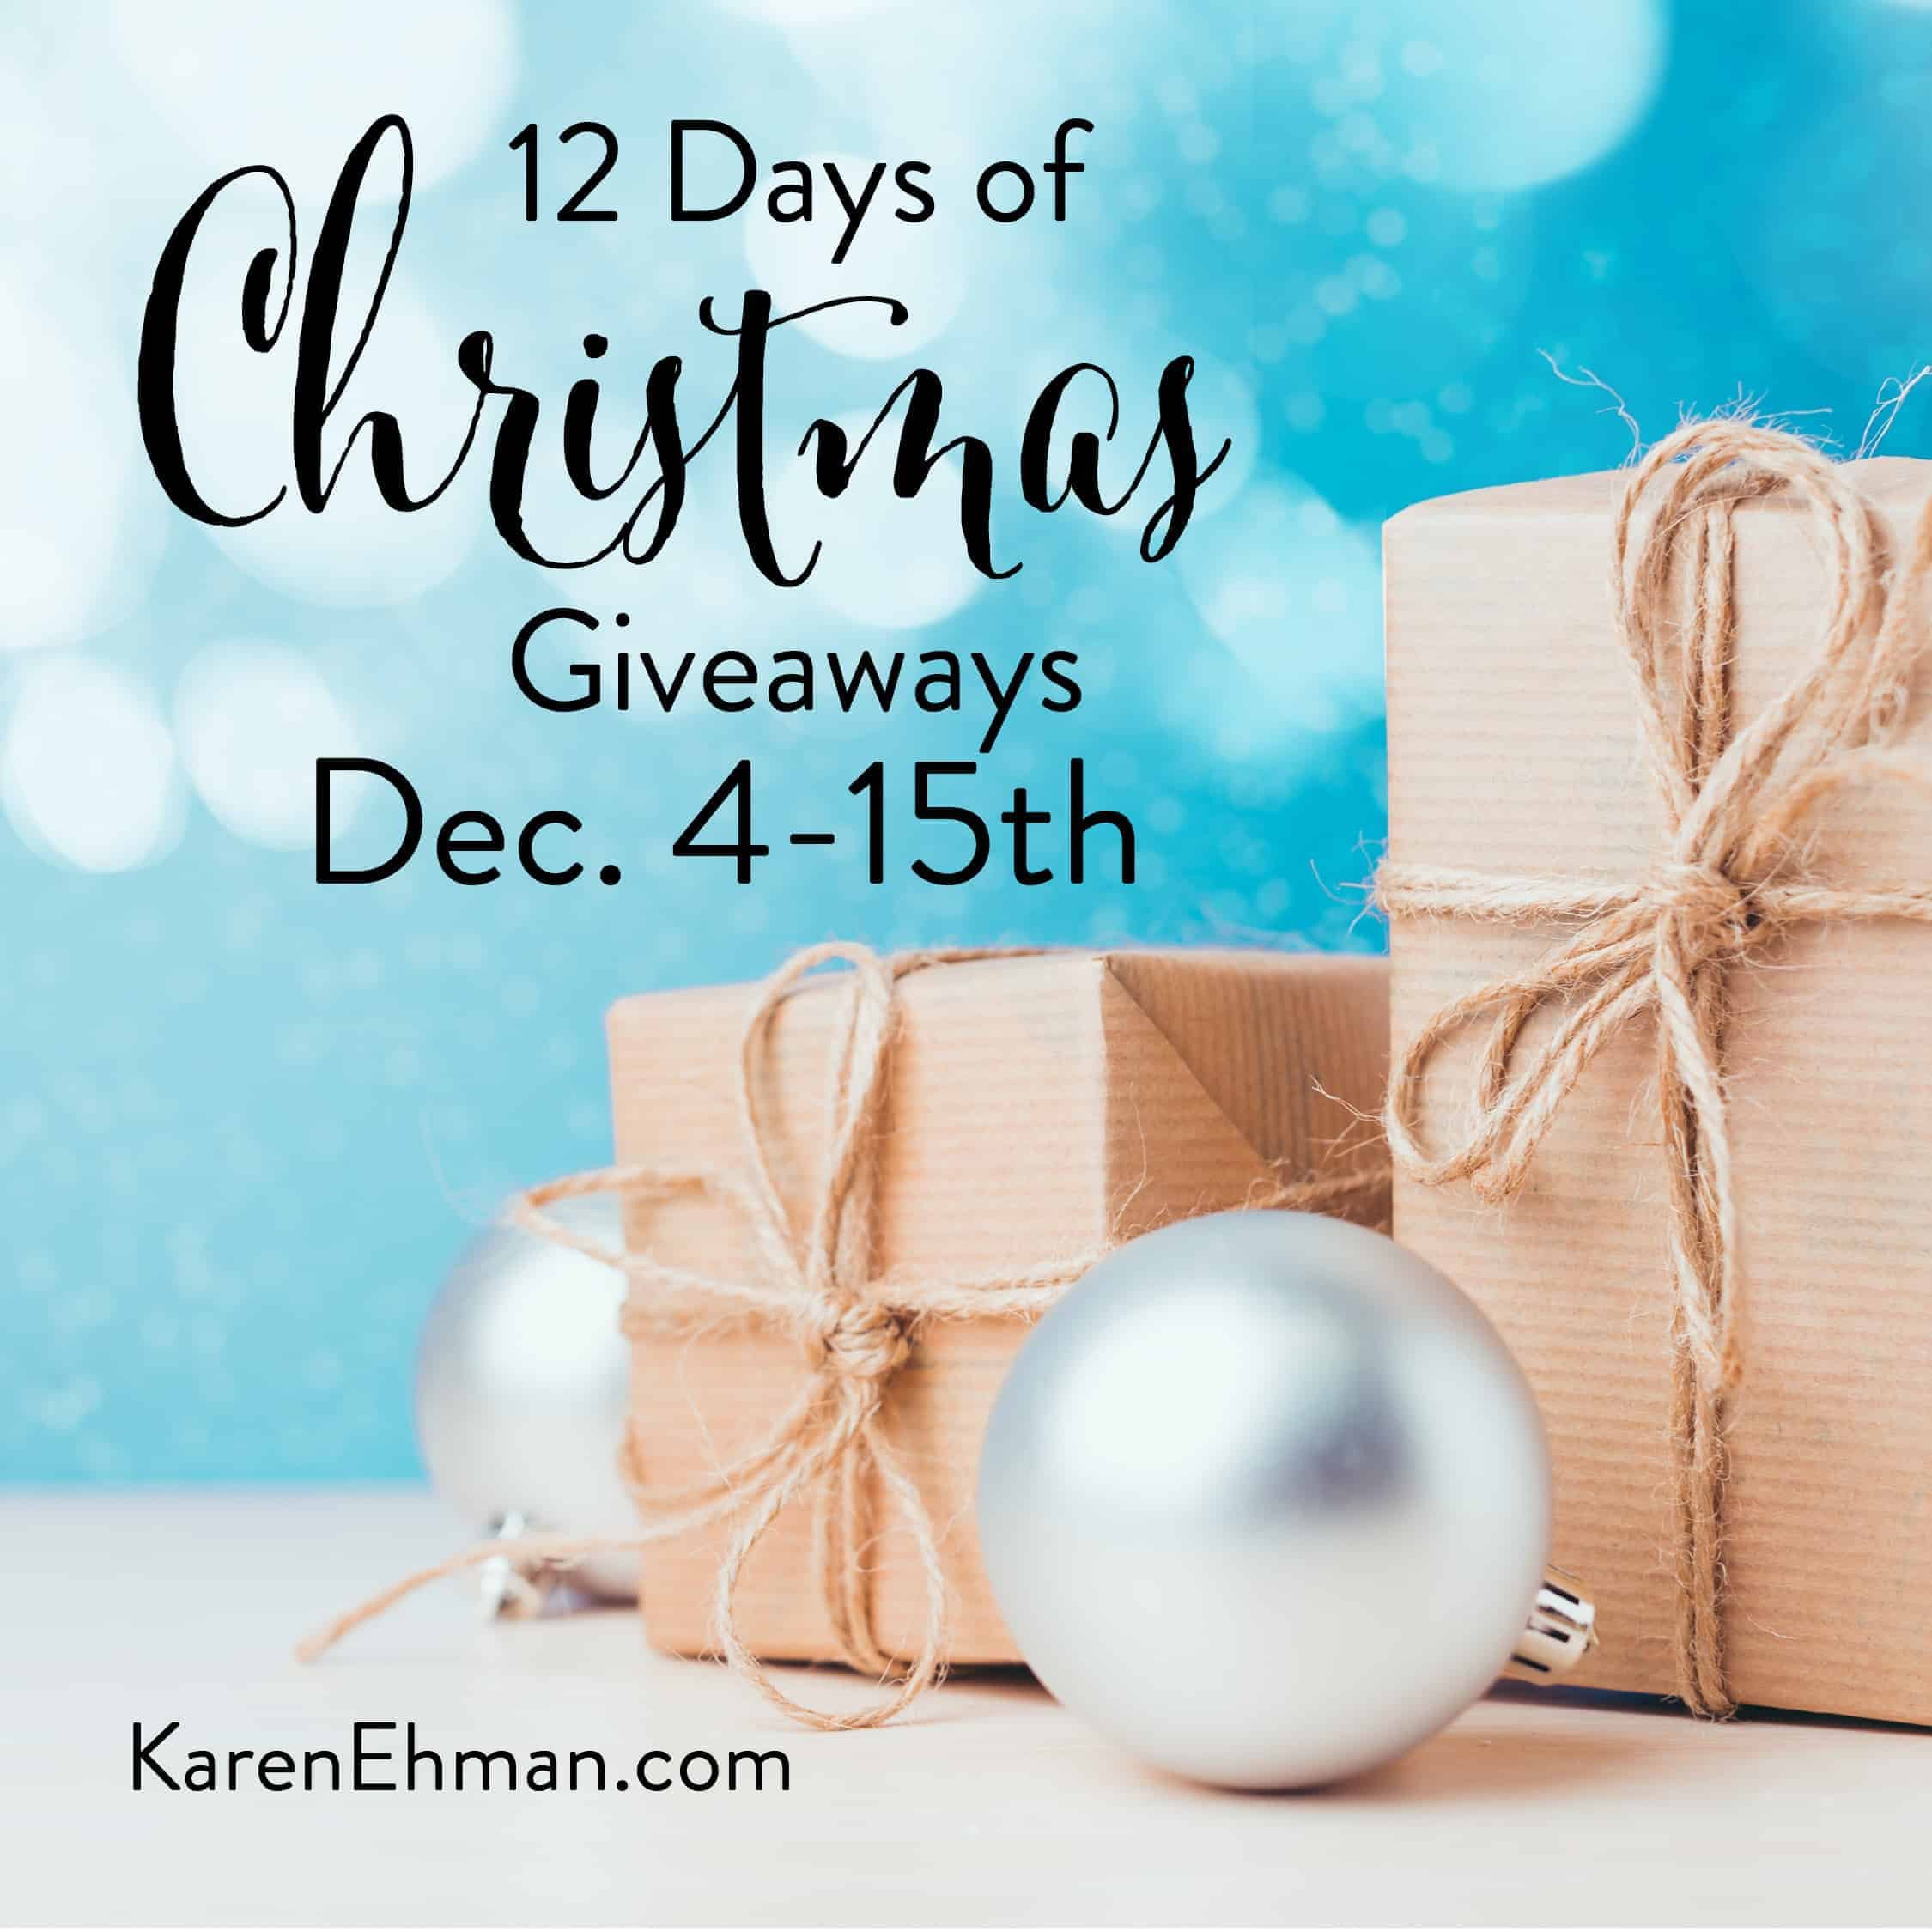 12 Days of Christmas Giveaways starts December 4!